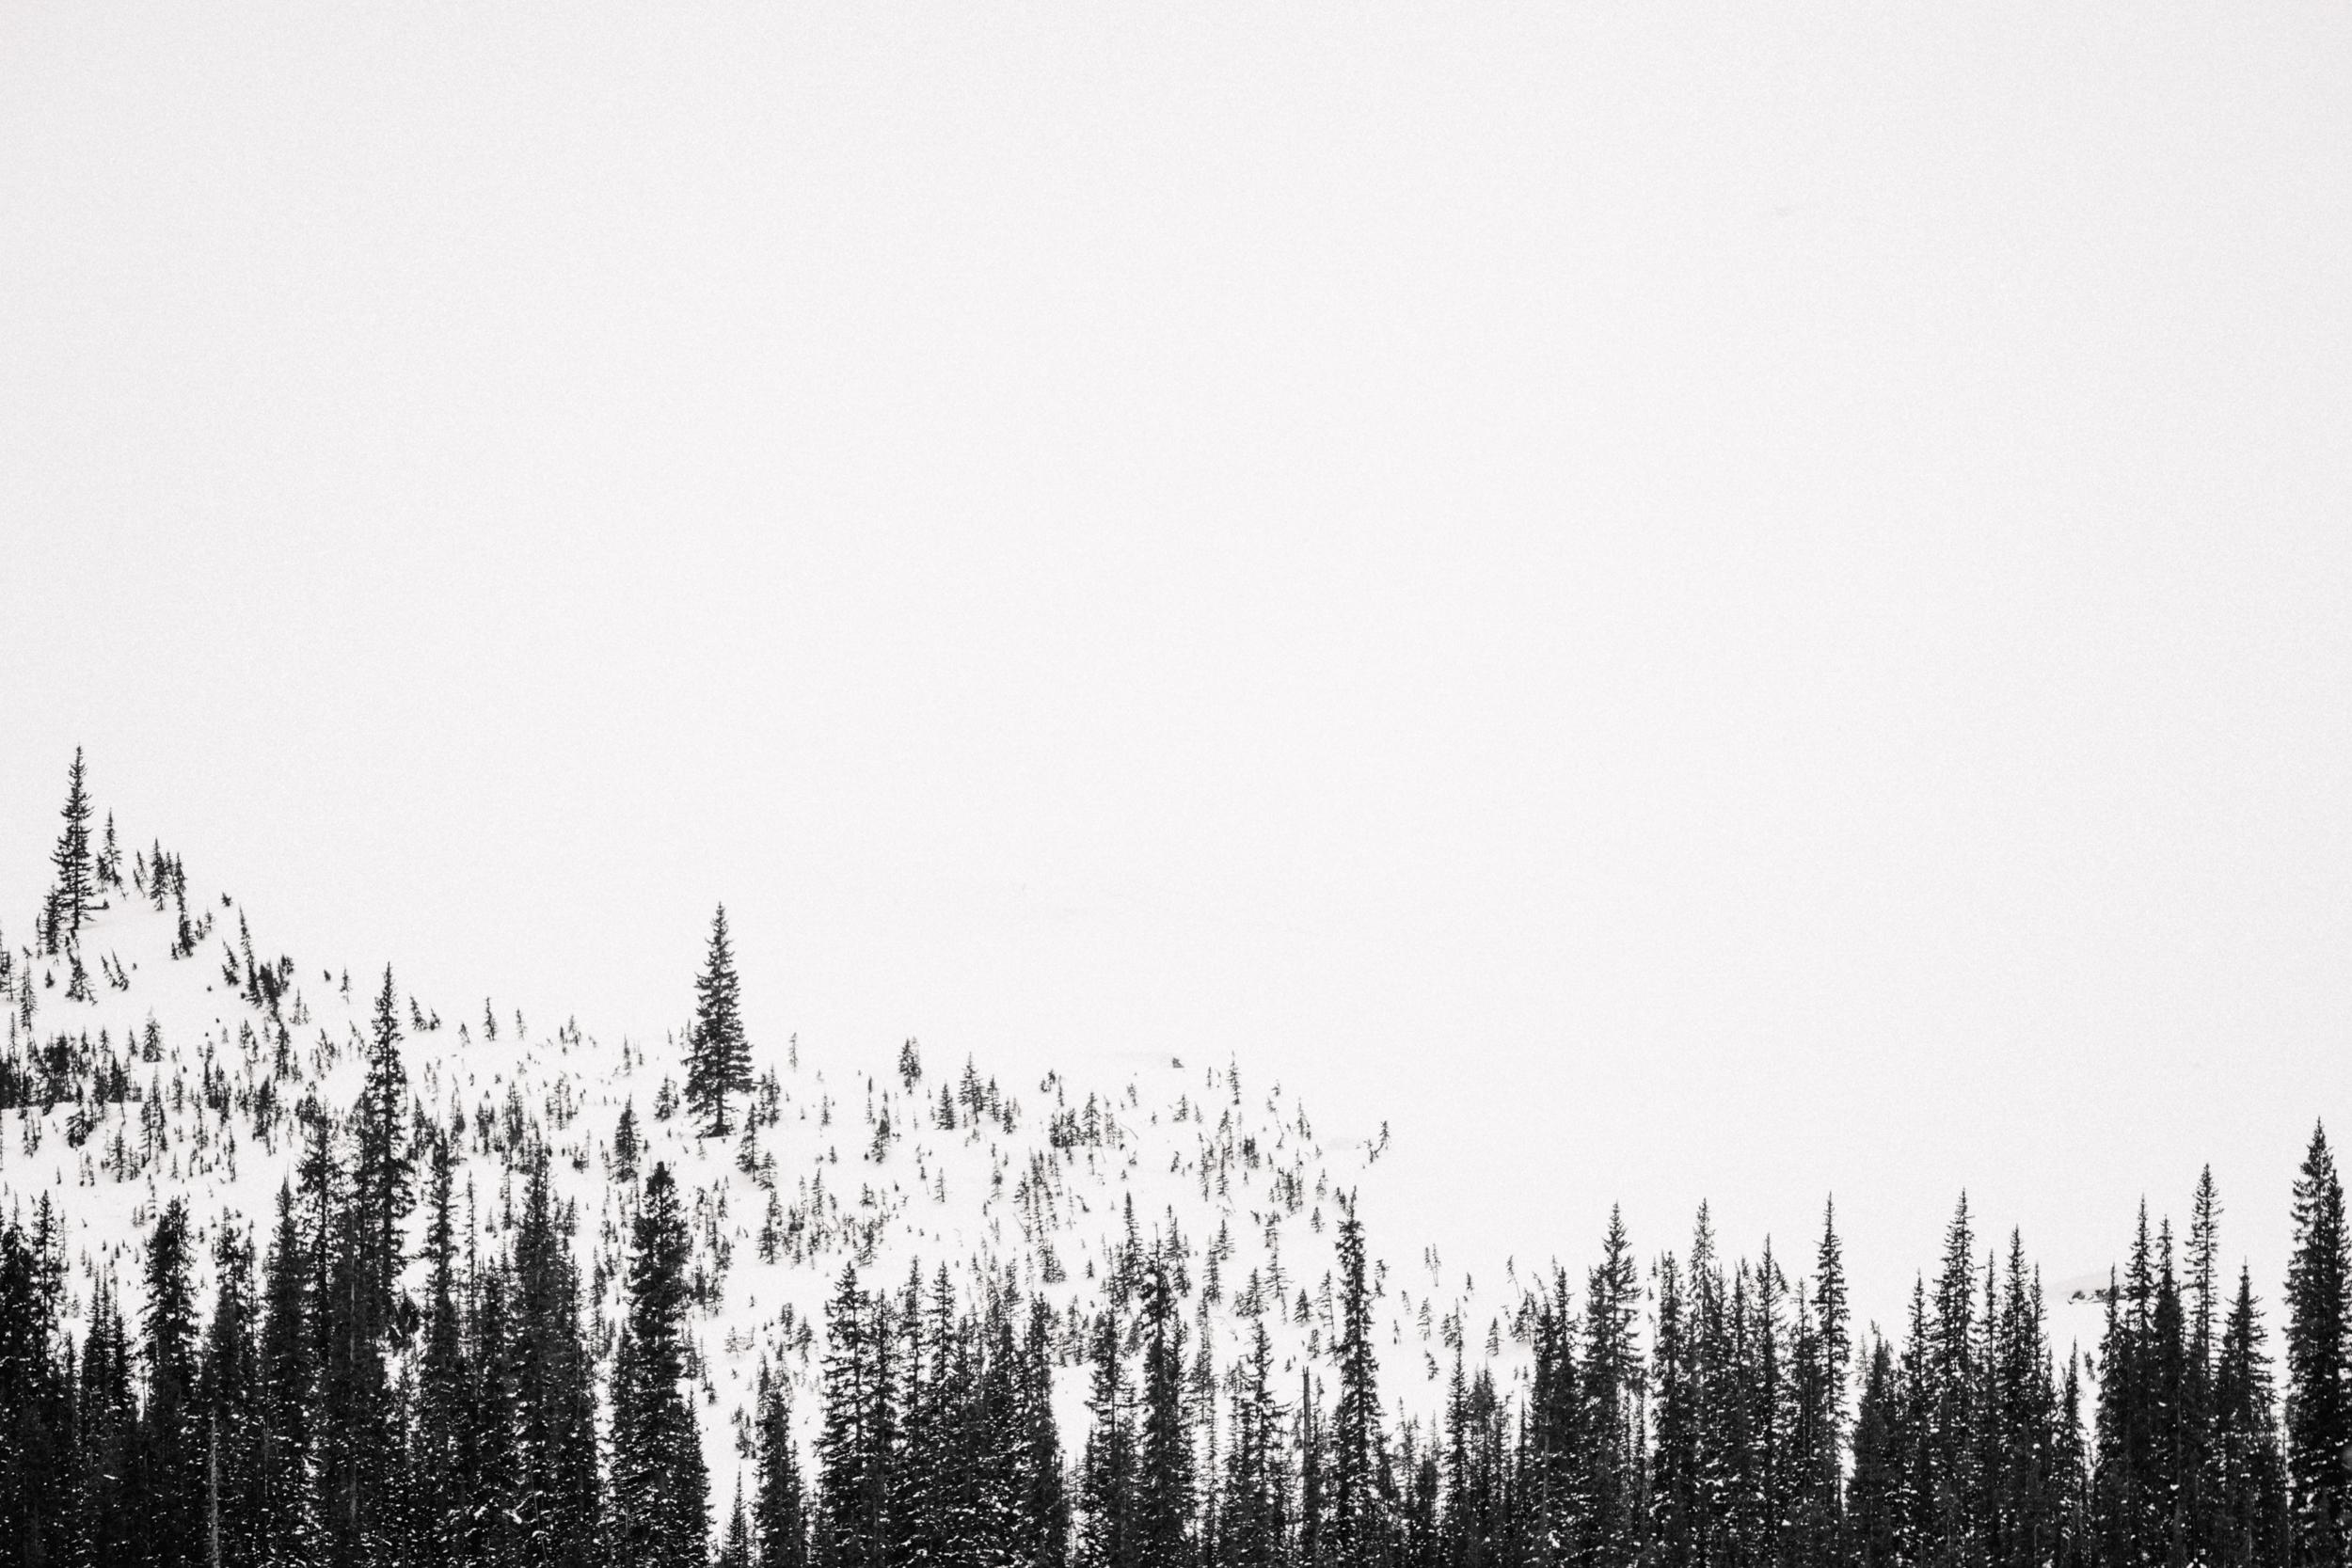 Banff_2018-17.jpg